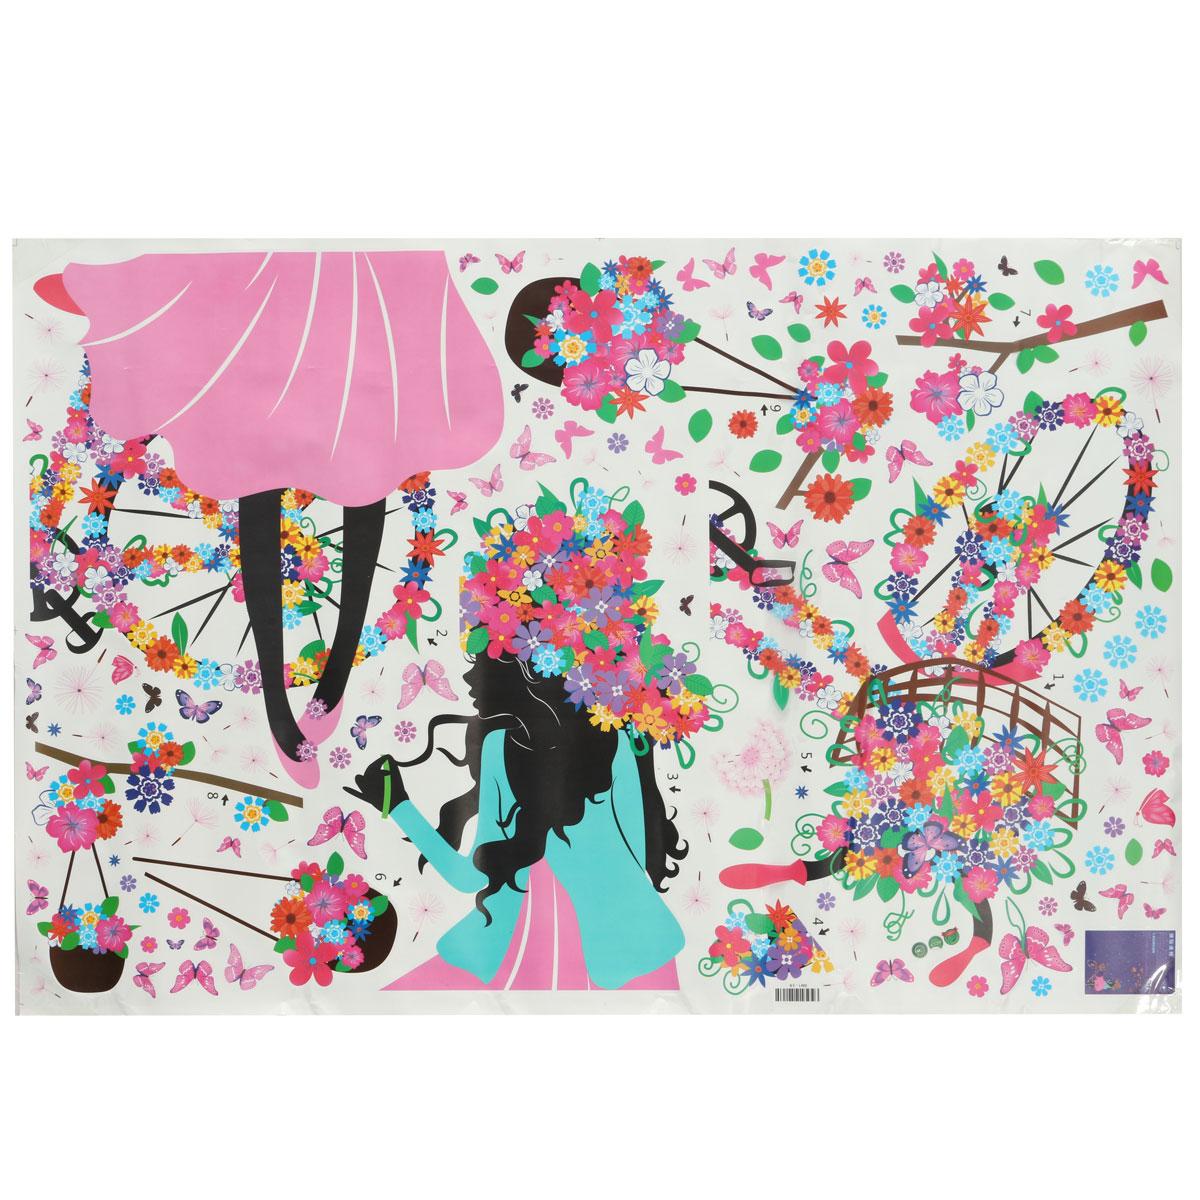 Diy autocollant fille fleur v lo stickers mural d cor for Autocollant mural